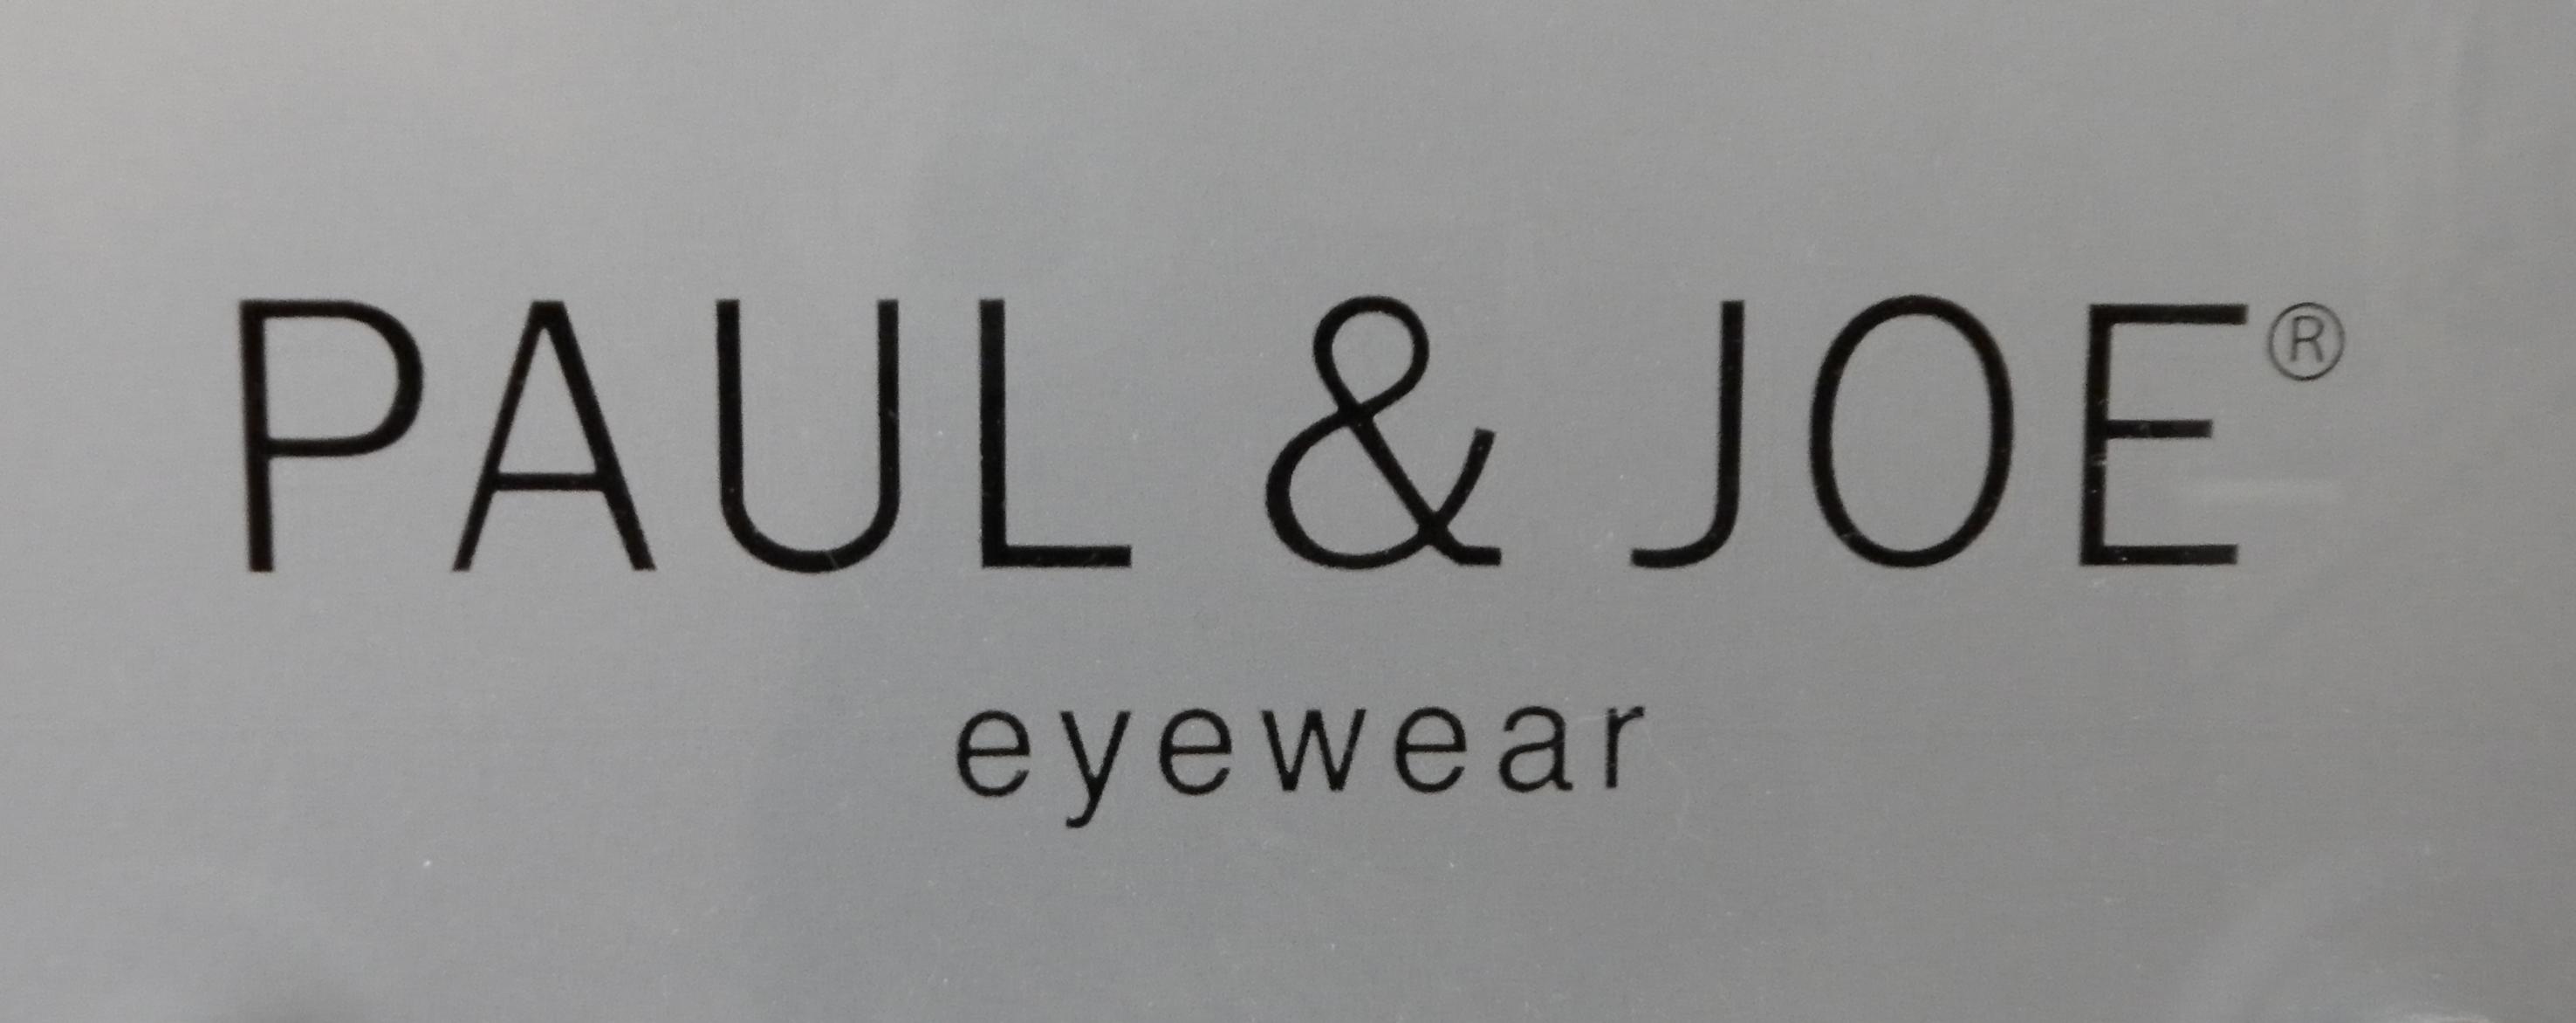 paul&joeLOGO